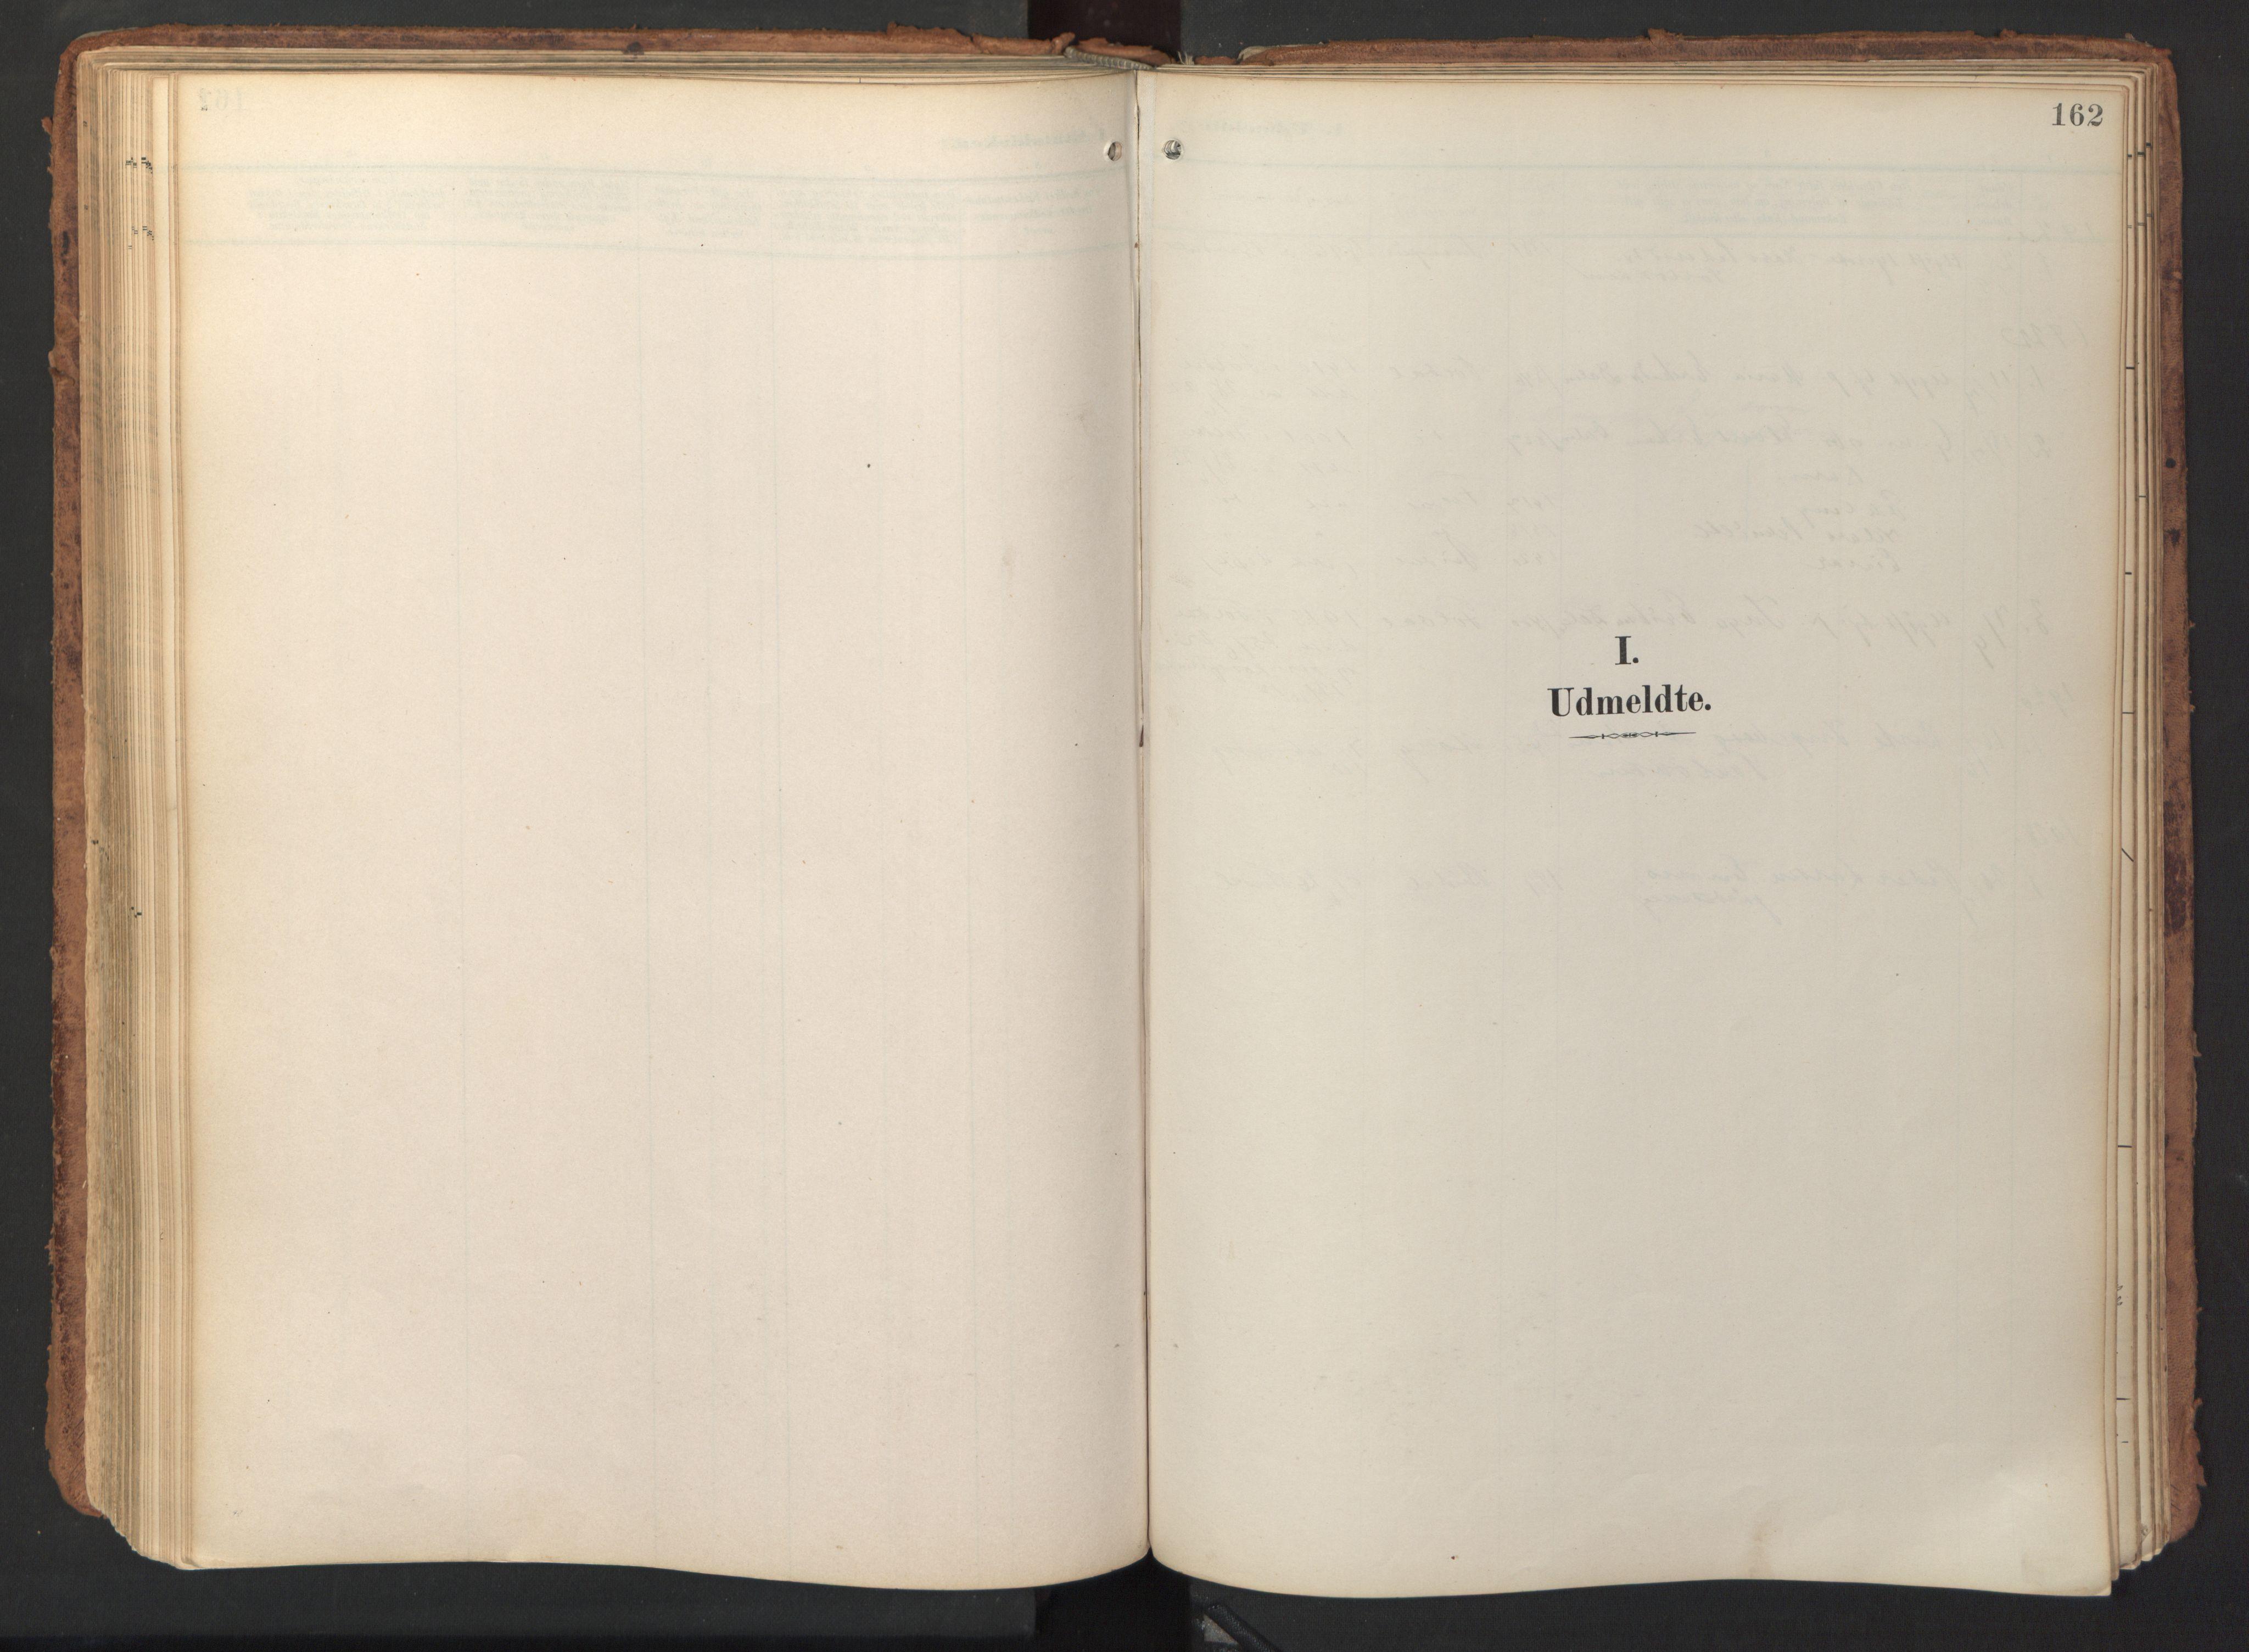 SAT, Ministerialprotokoller, klokkerbøker og fødselsregistre - Sør-Trøndelag, 690/L1050: Parish register (official) no. 690A01, 1889-1929, p. 162